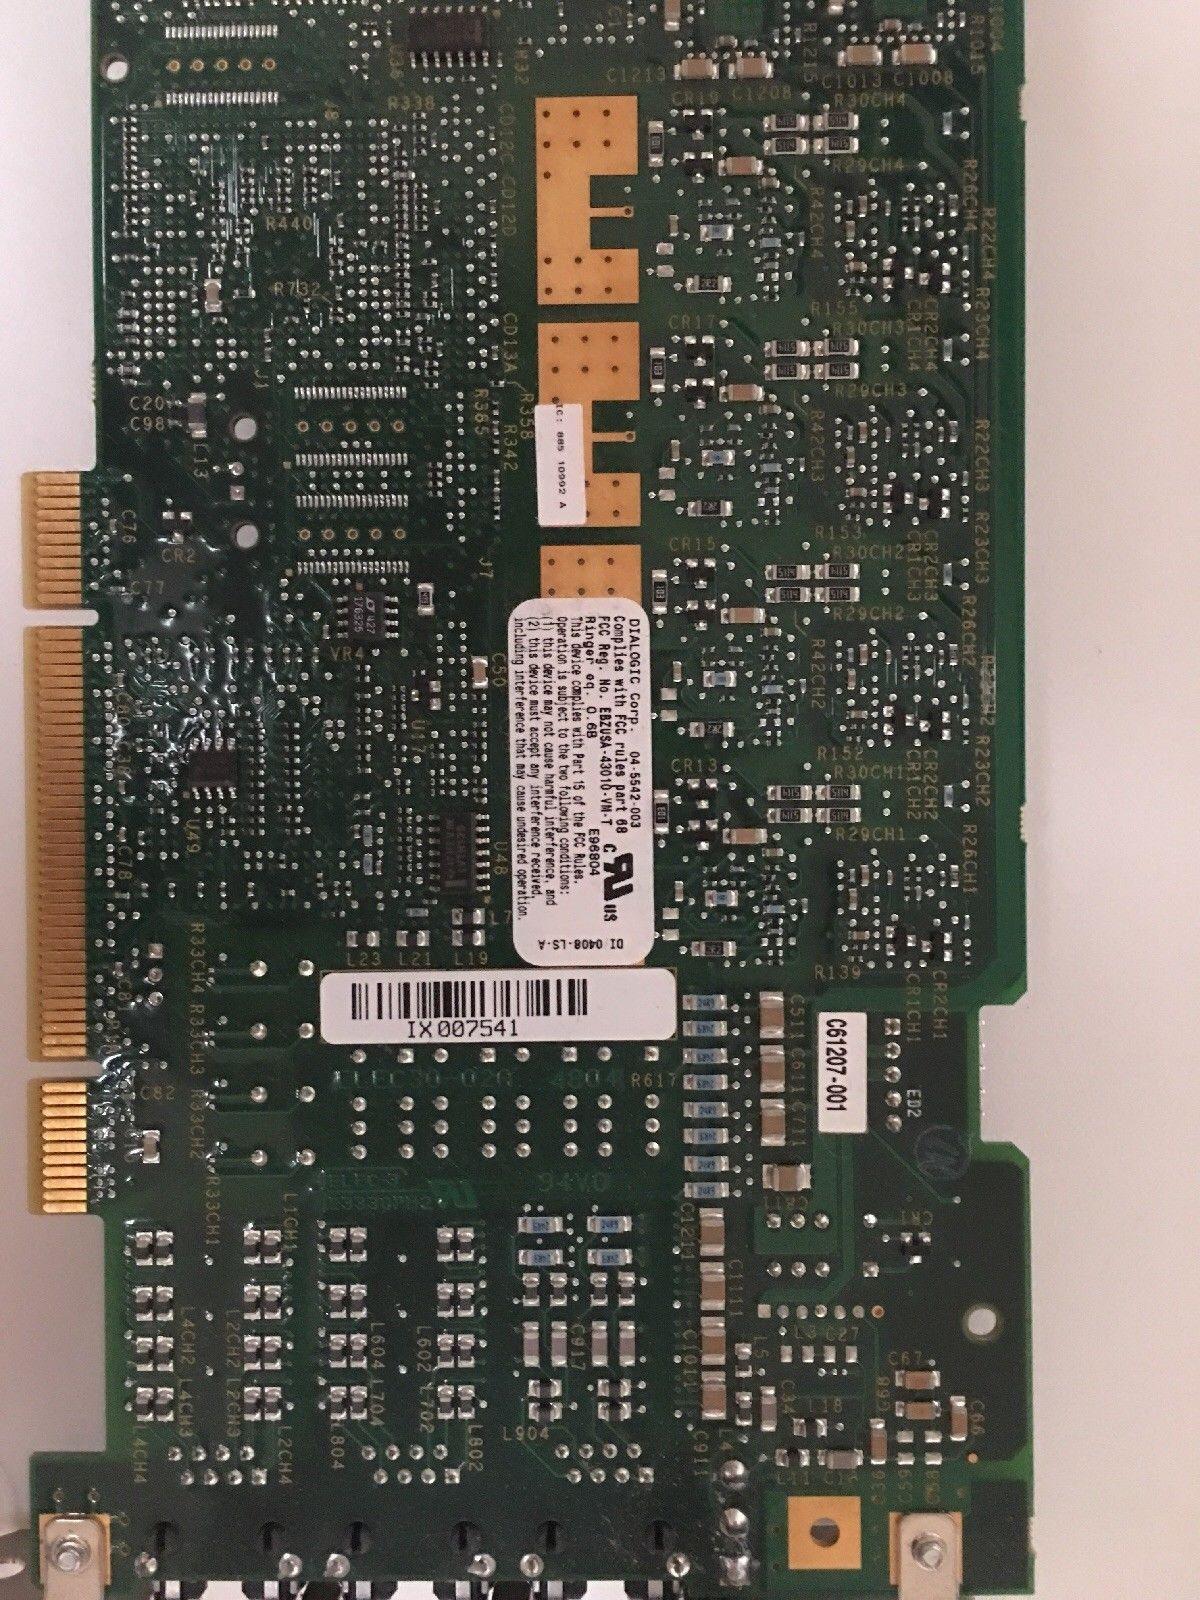 Endüstriyel ekipman panosu Dialogic DI / 0408-LS-A 04-5542-00296-0812-110 83-0668-004